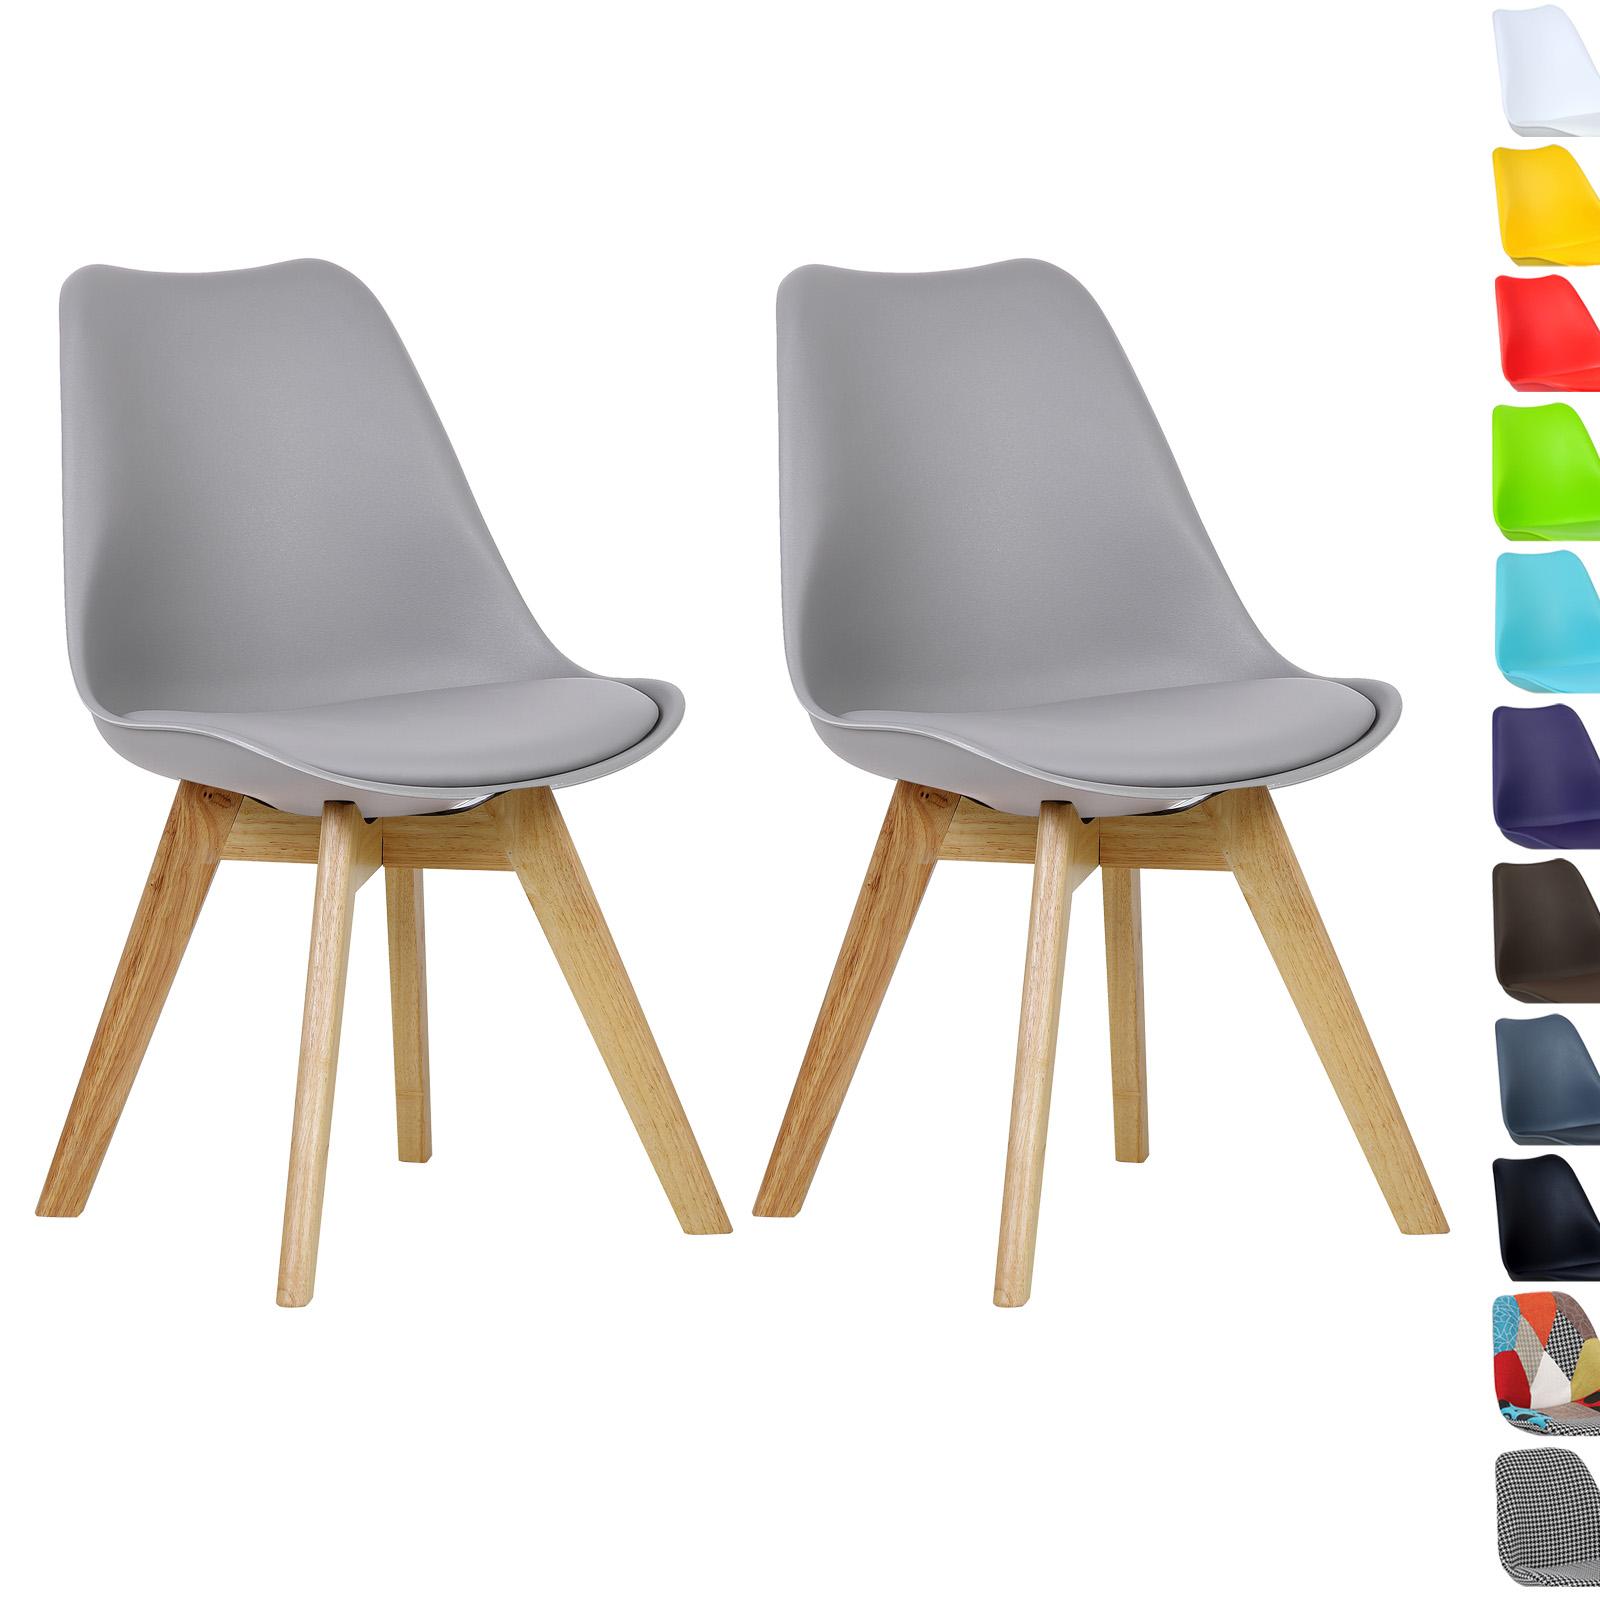 Design Stühle Holz 2 x esszimmerstühle esszimmerstuhl holz design stuhl küchenstuhl stühle 364 ebay